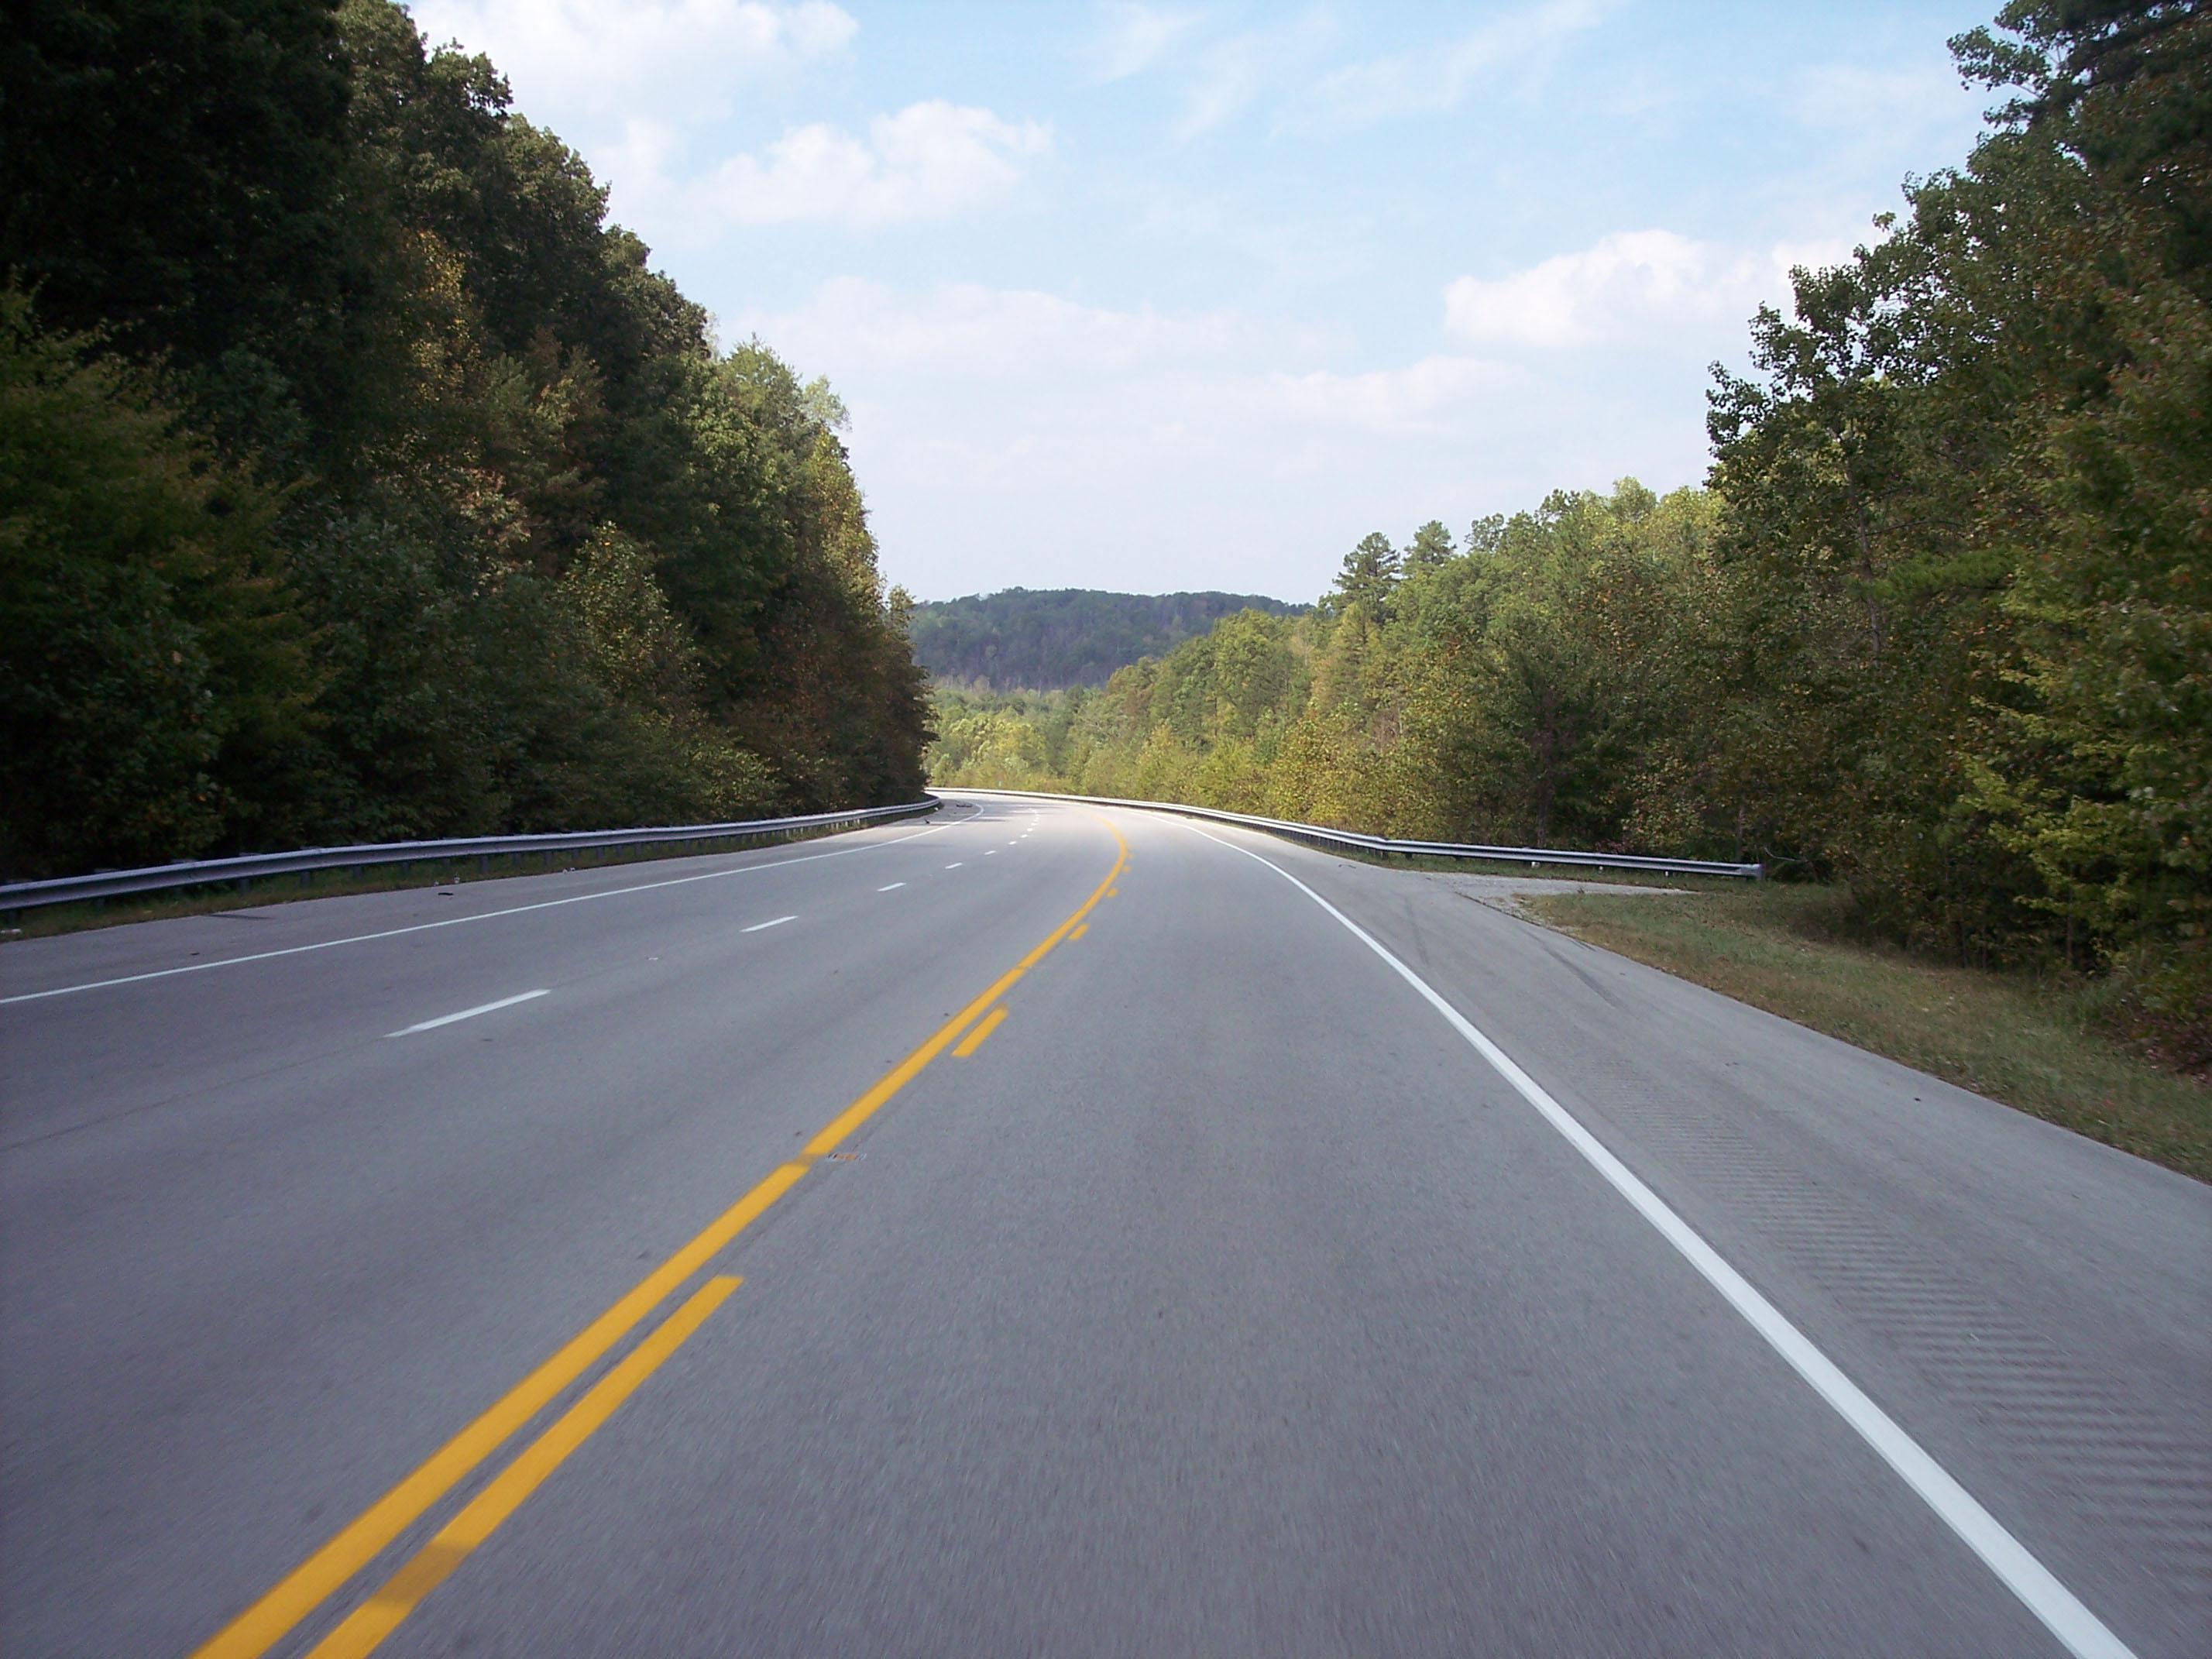 Portland Cement Roads : Cement replaces bitumen in major highway project